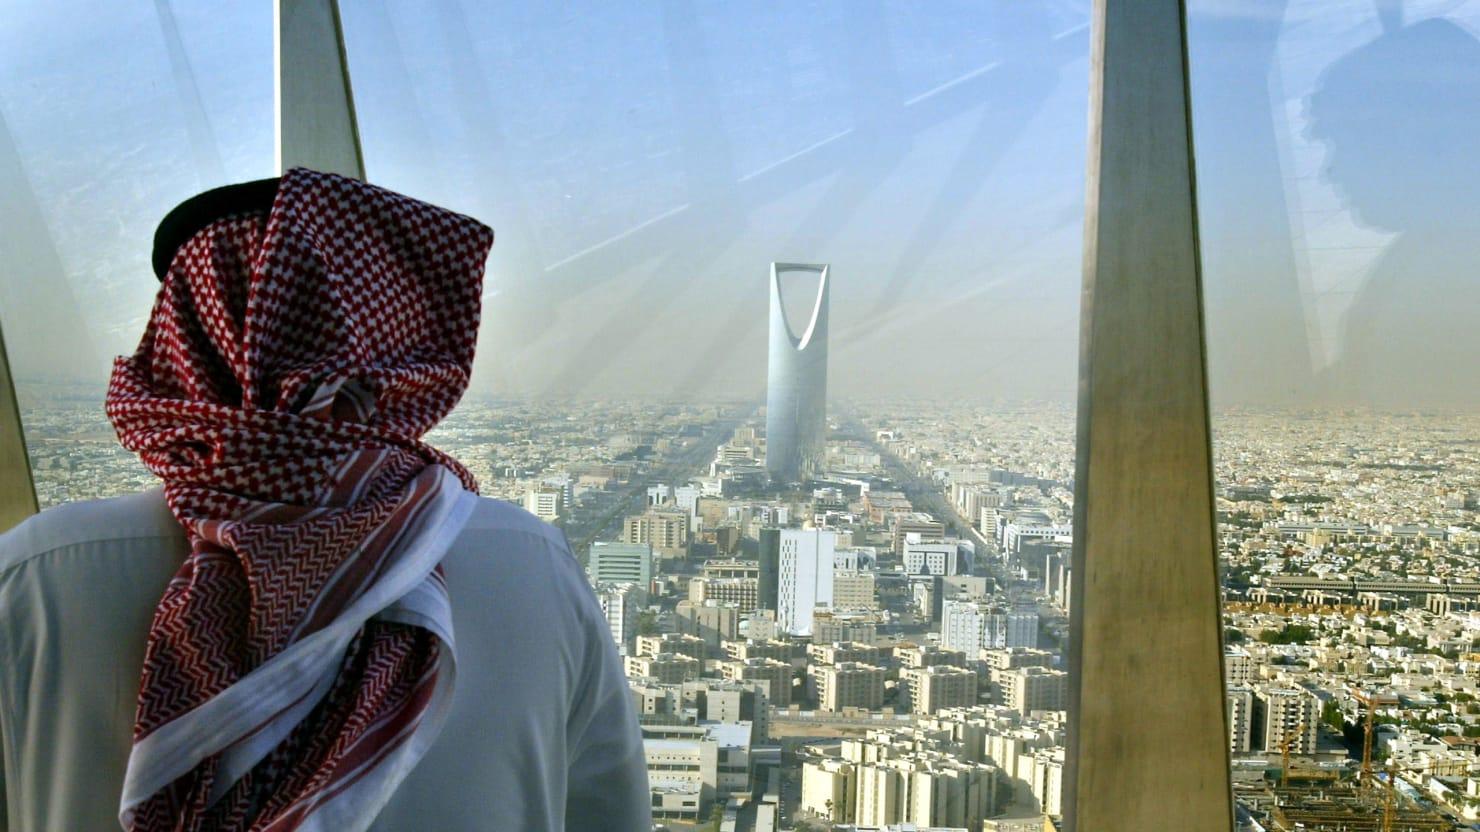 Saudi Arabia May Go Nuclear Because of Obama's Iran Deal